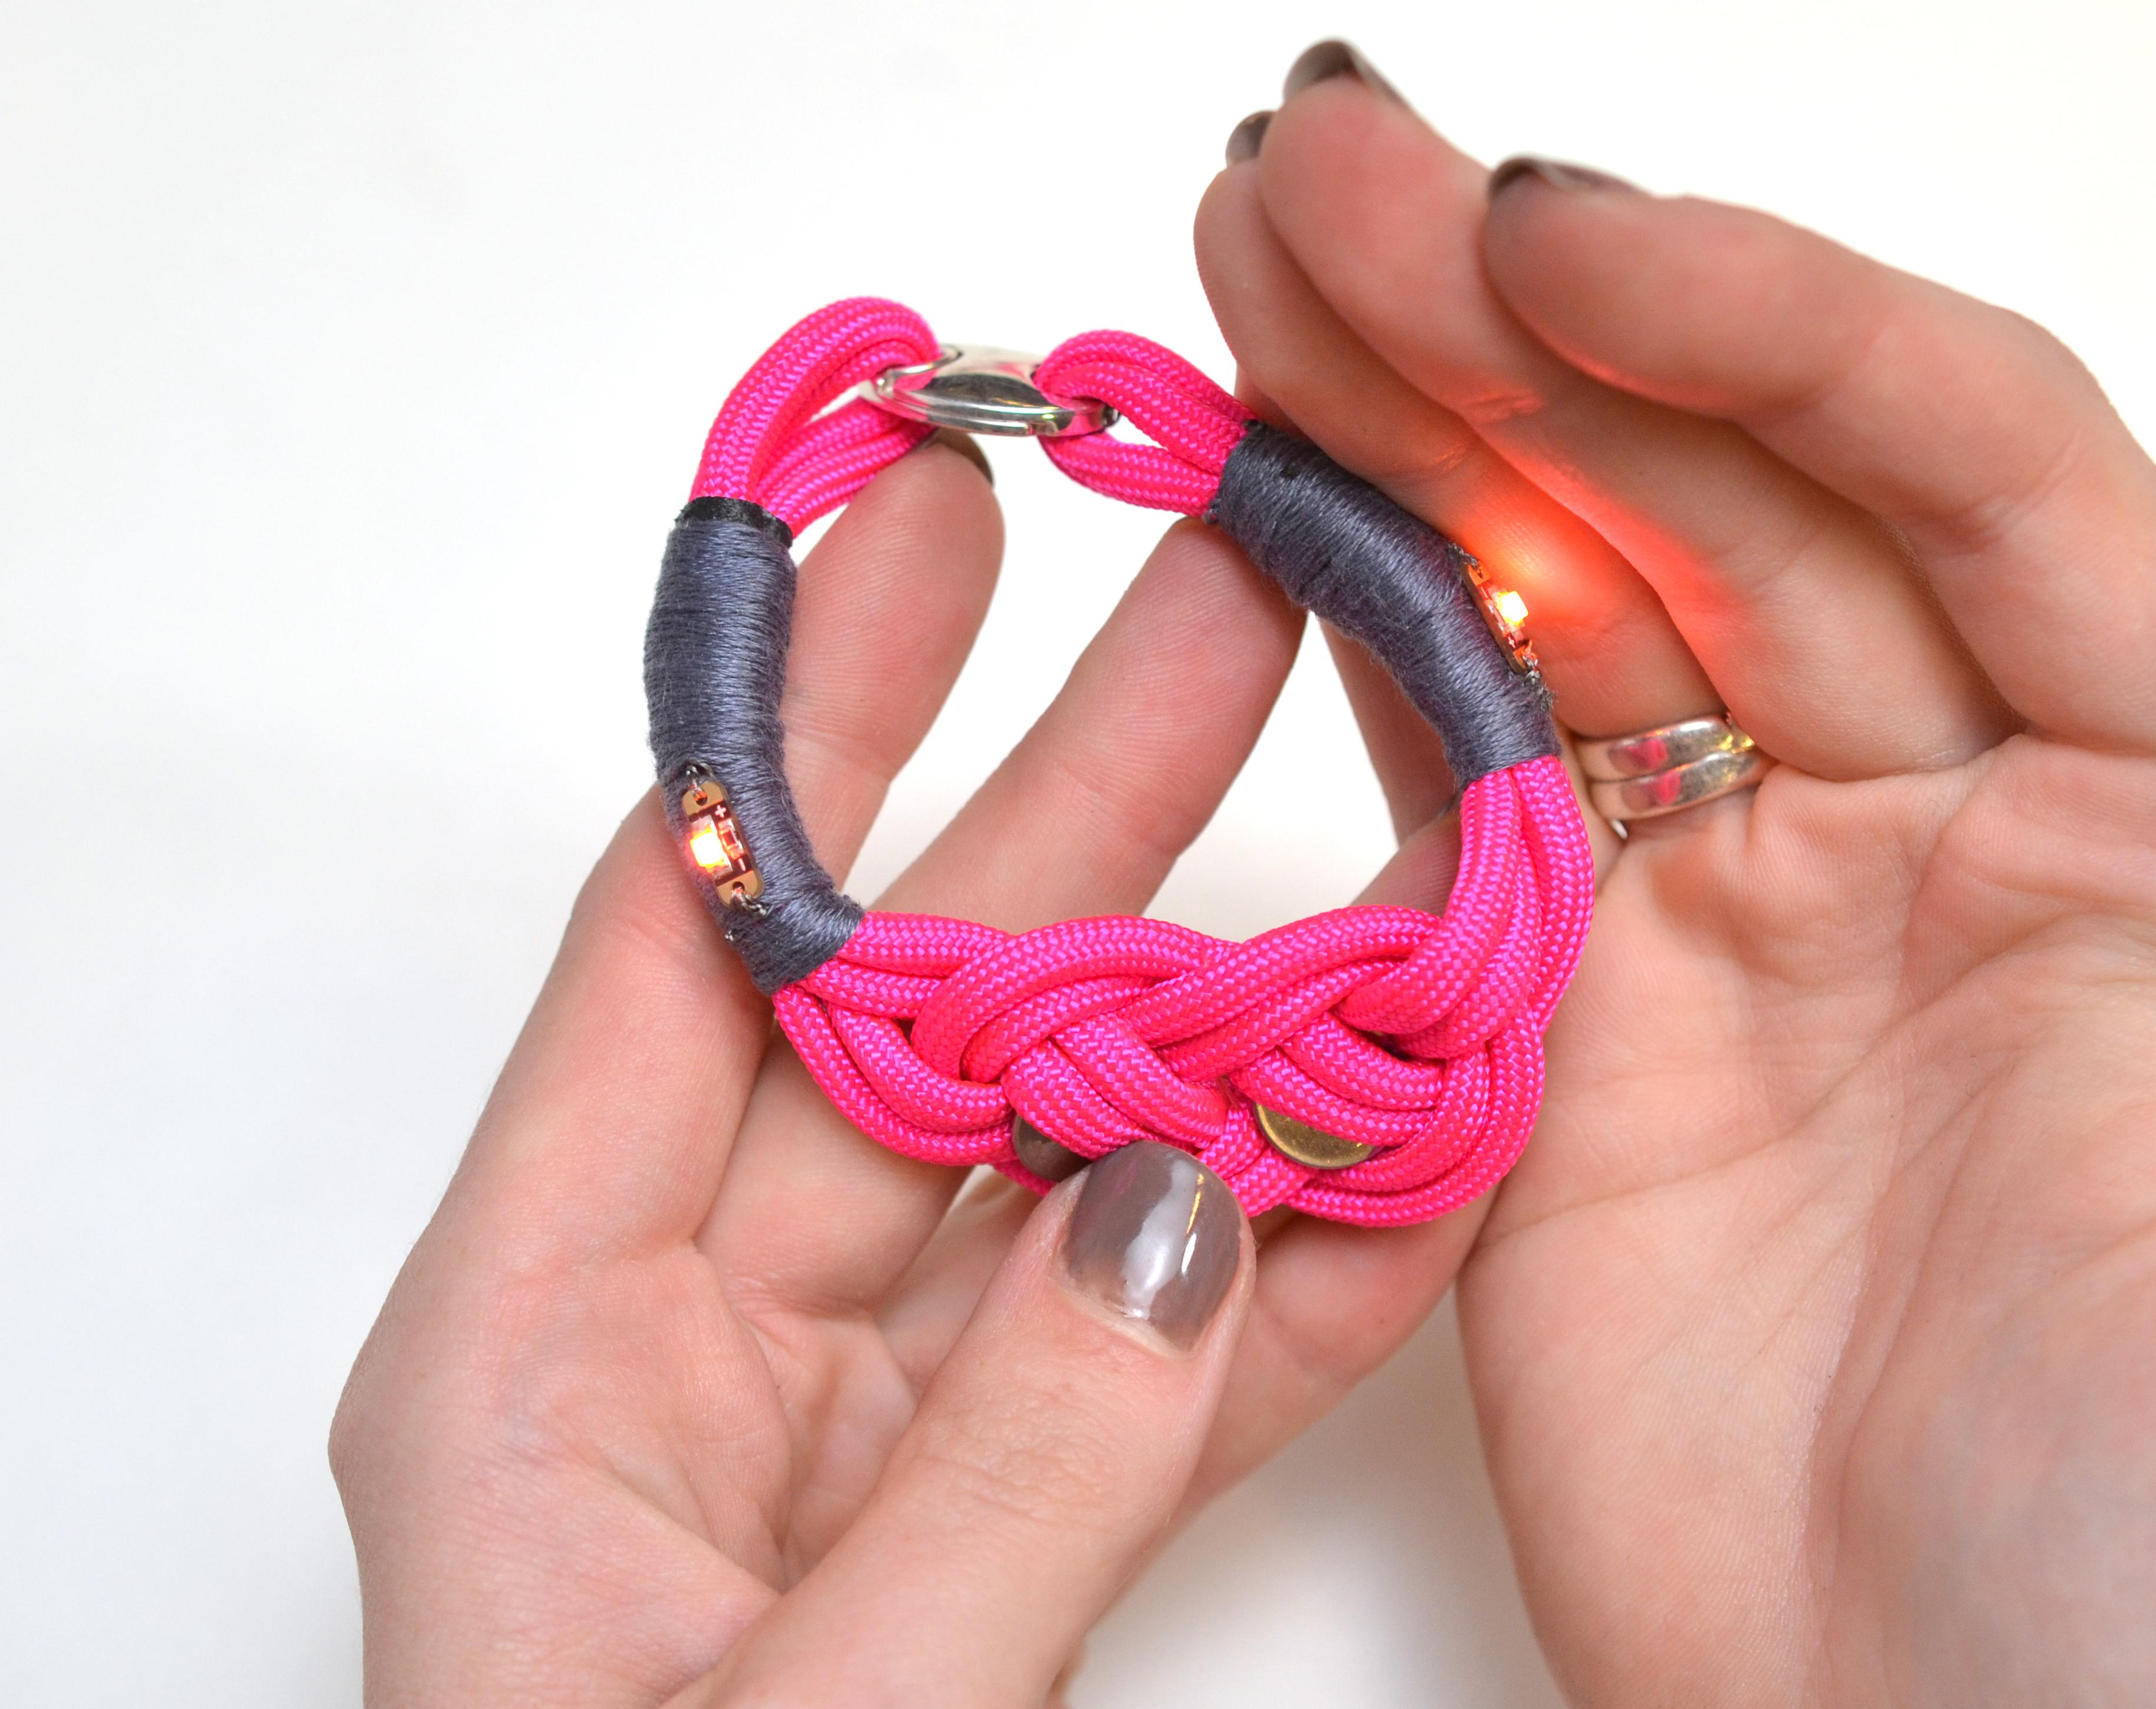 leds_nautical-paracord-led-sequin-friendship-bracelet-59.jpg